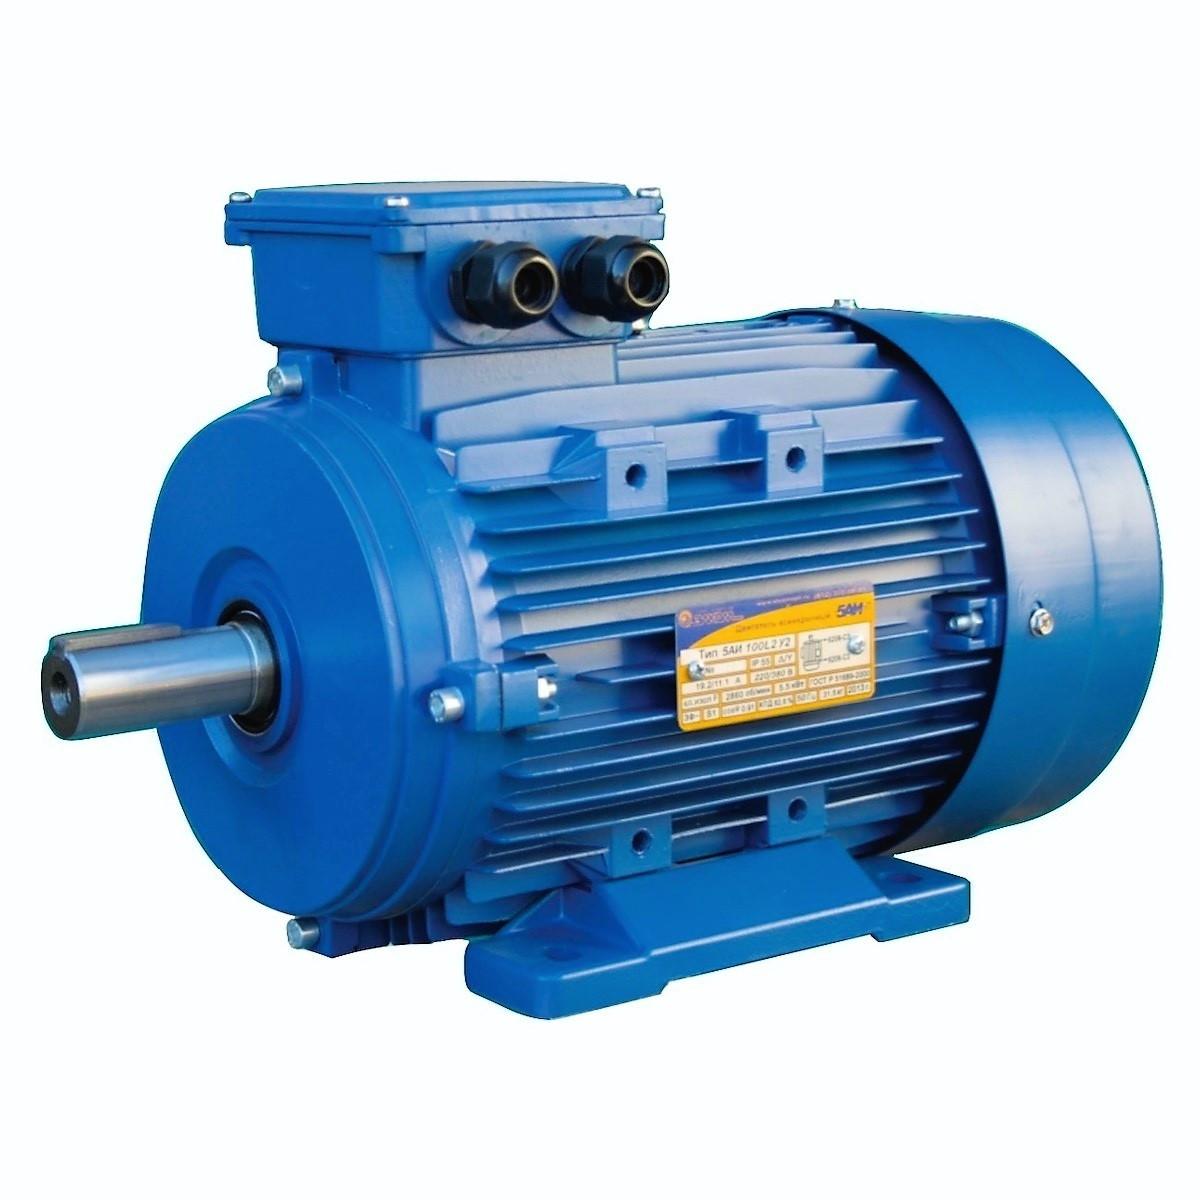 Электродвигатель 5АИ 100 S2 4кВт 3000 об/мин